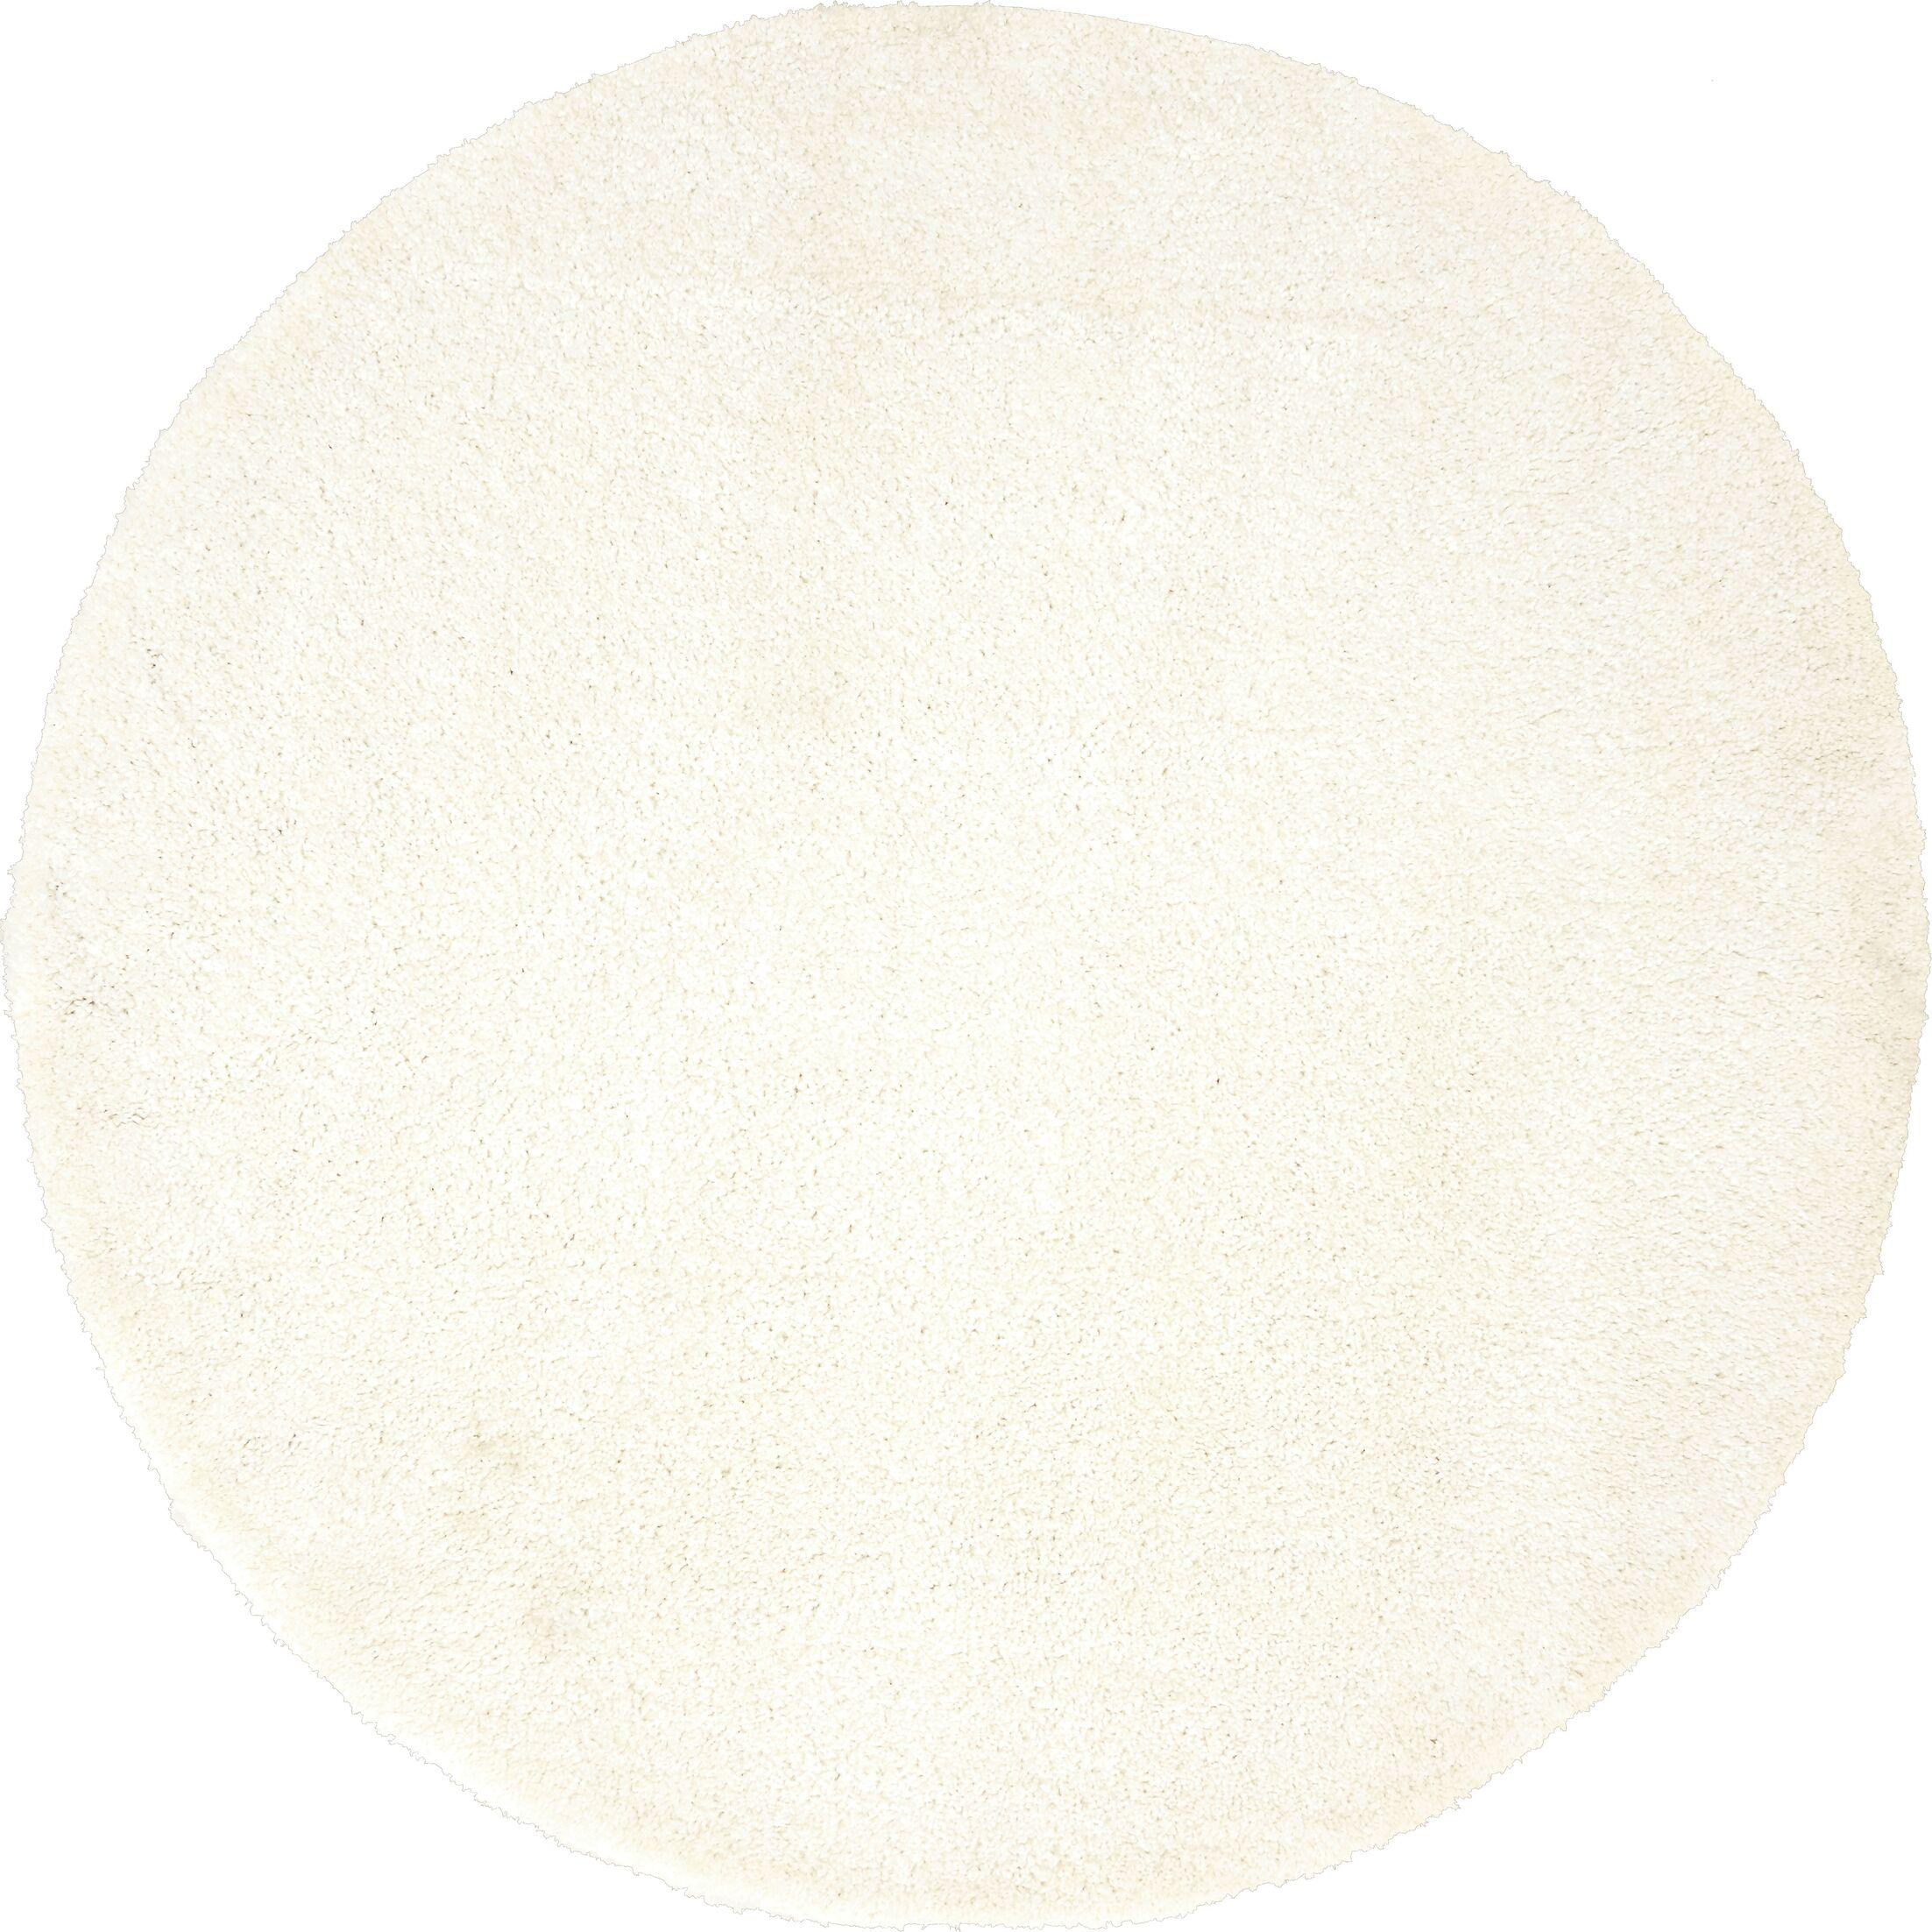 Truett White Area Rug Rug Size: Round 6'